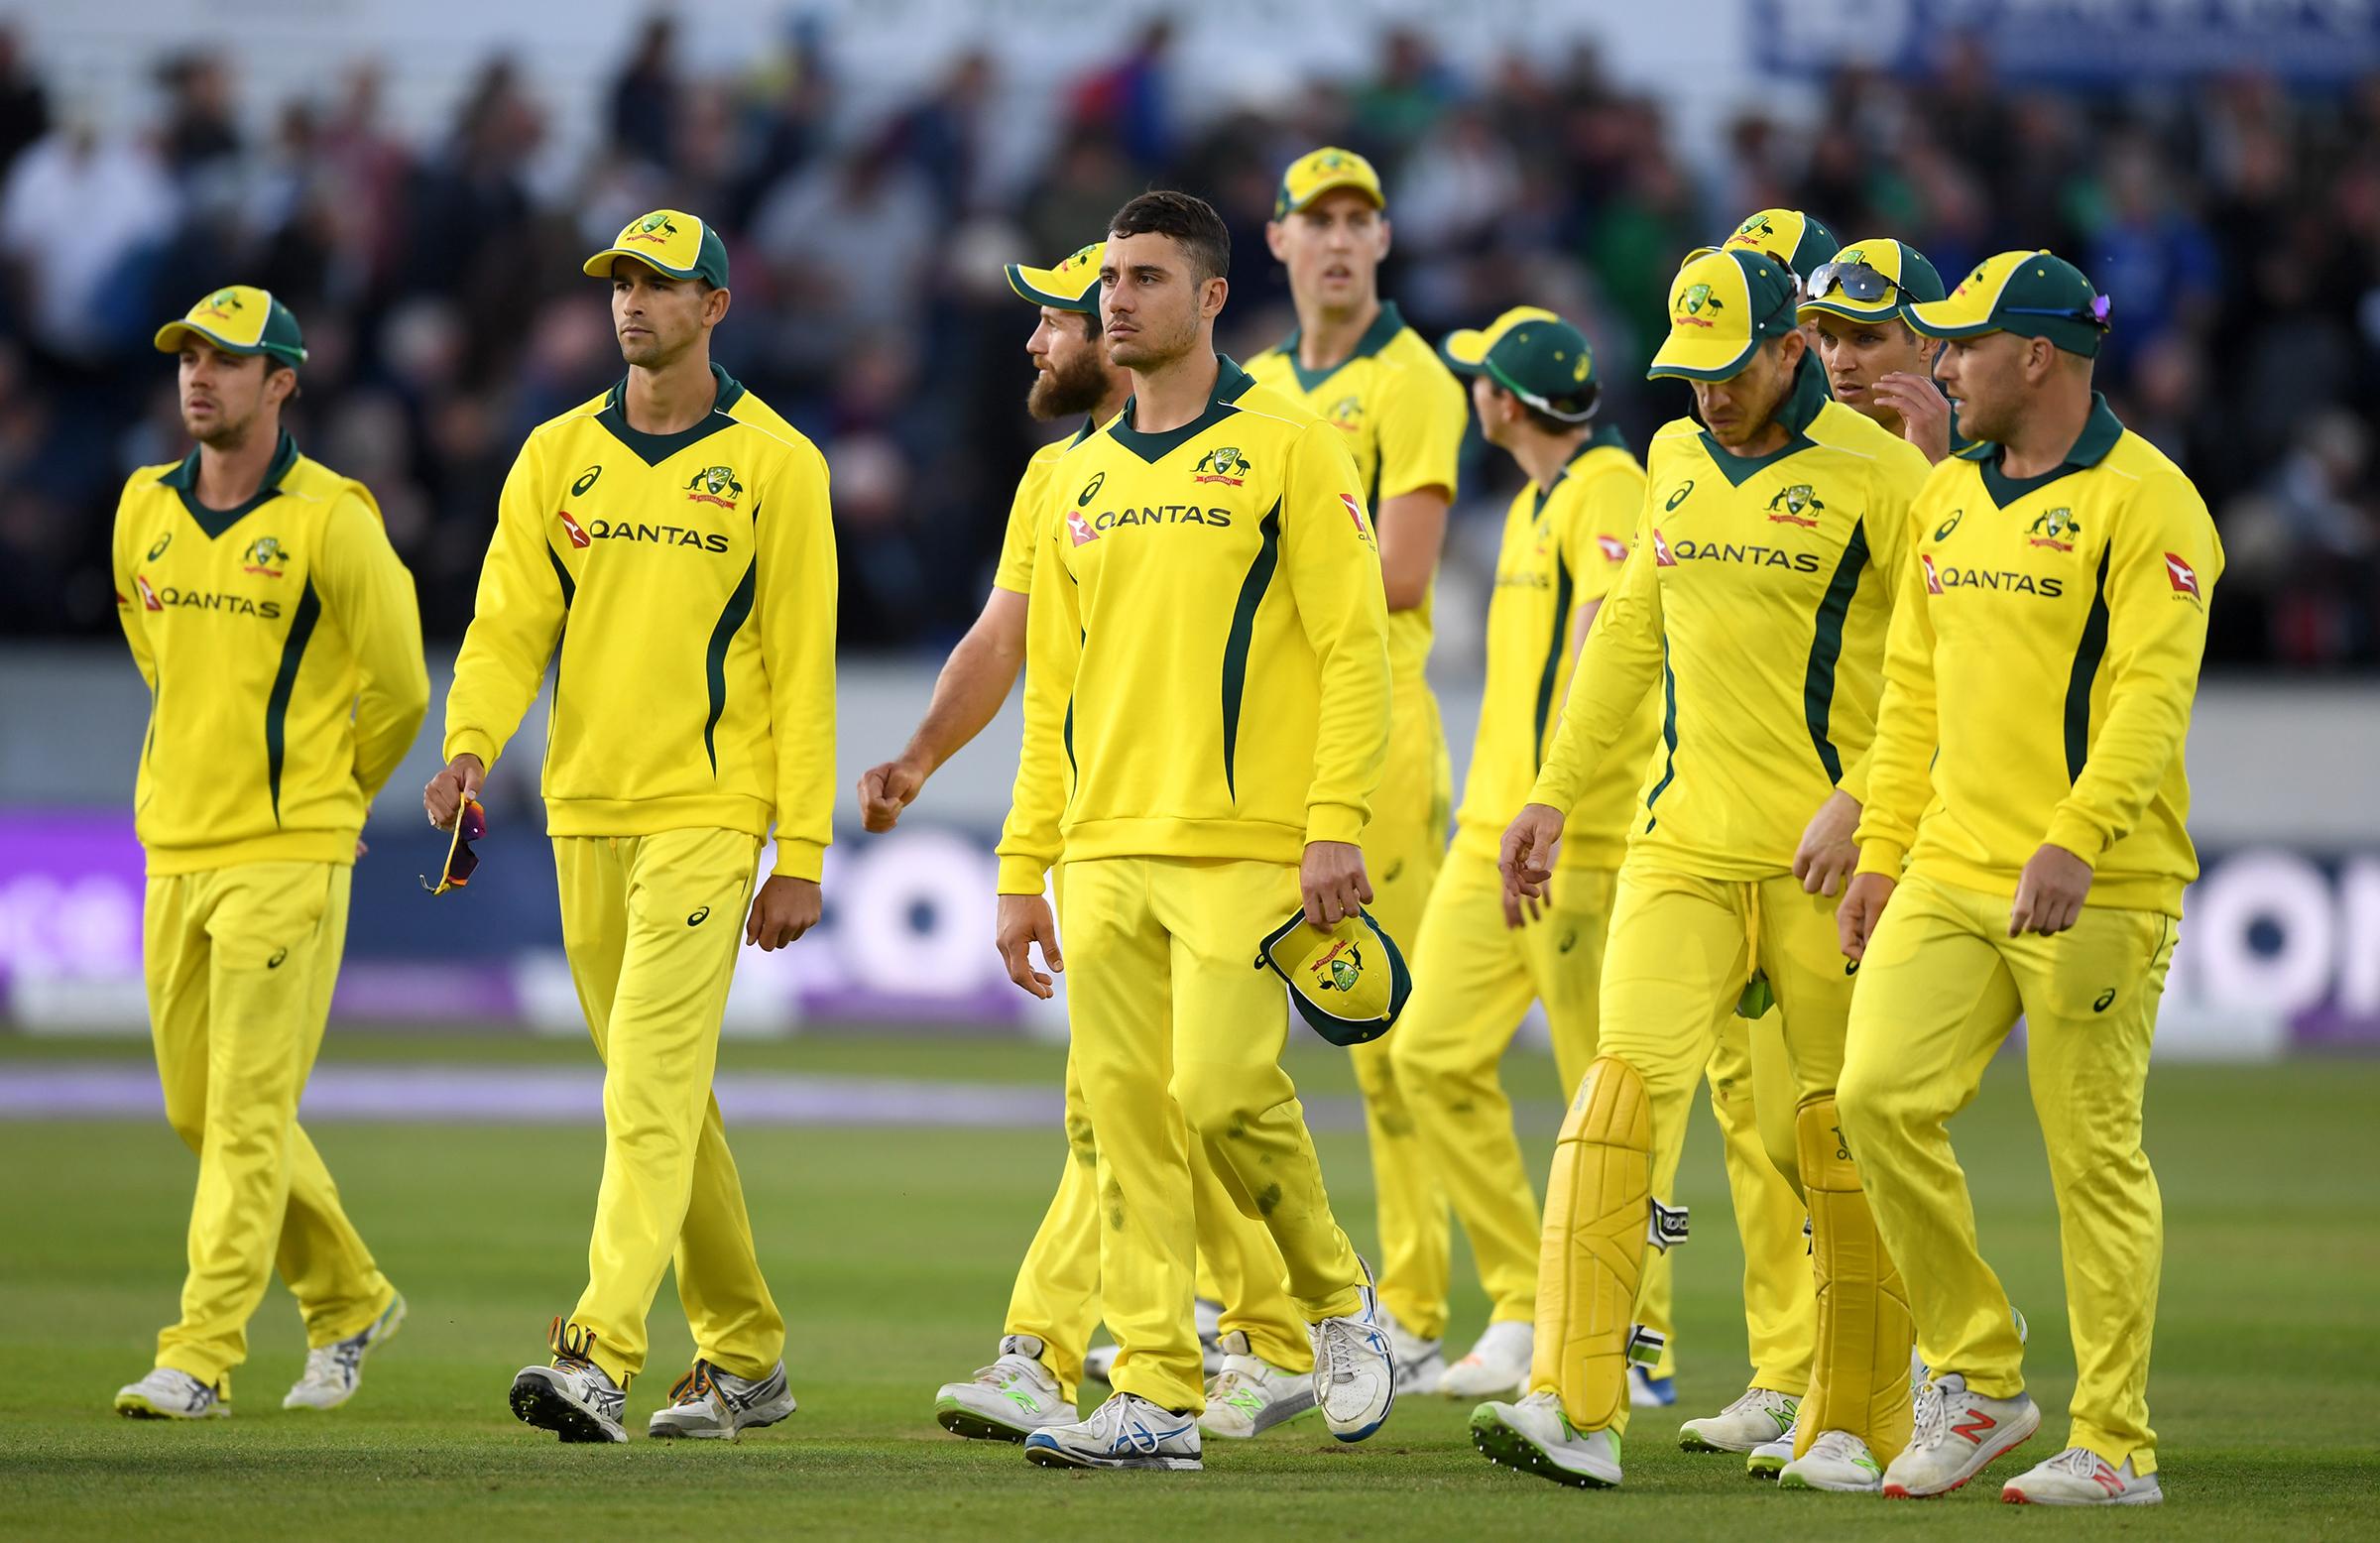 Australia slumped to their fourth straight loss // Getty